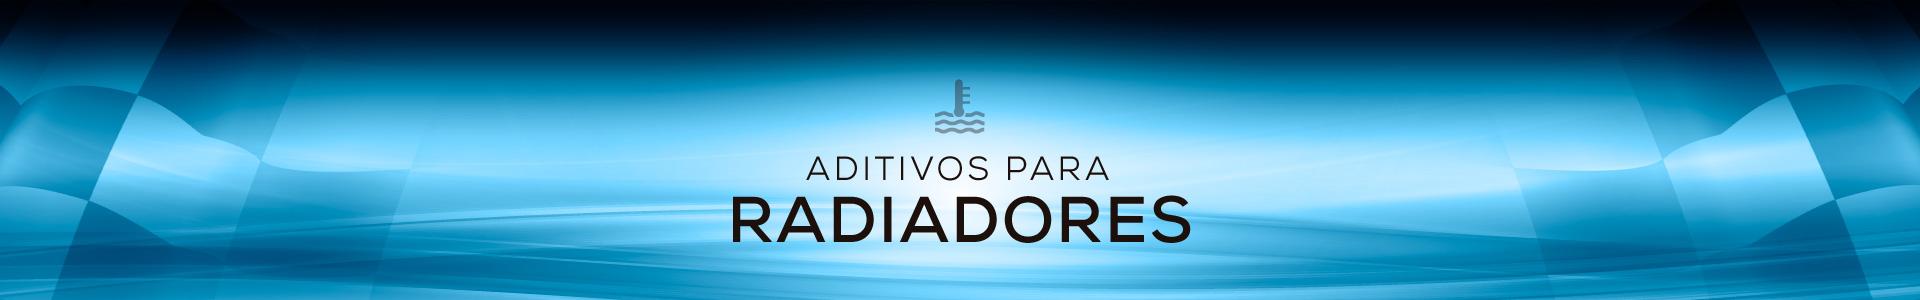 aditivos_para_radiadores-1920x300